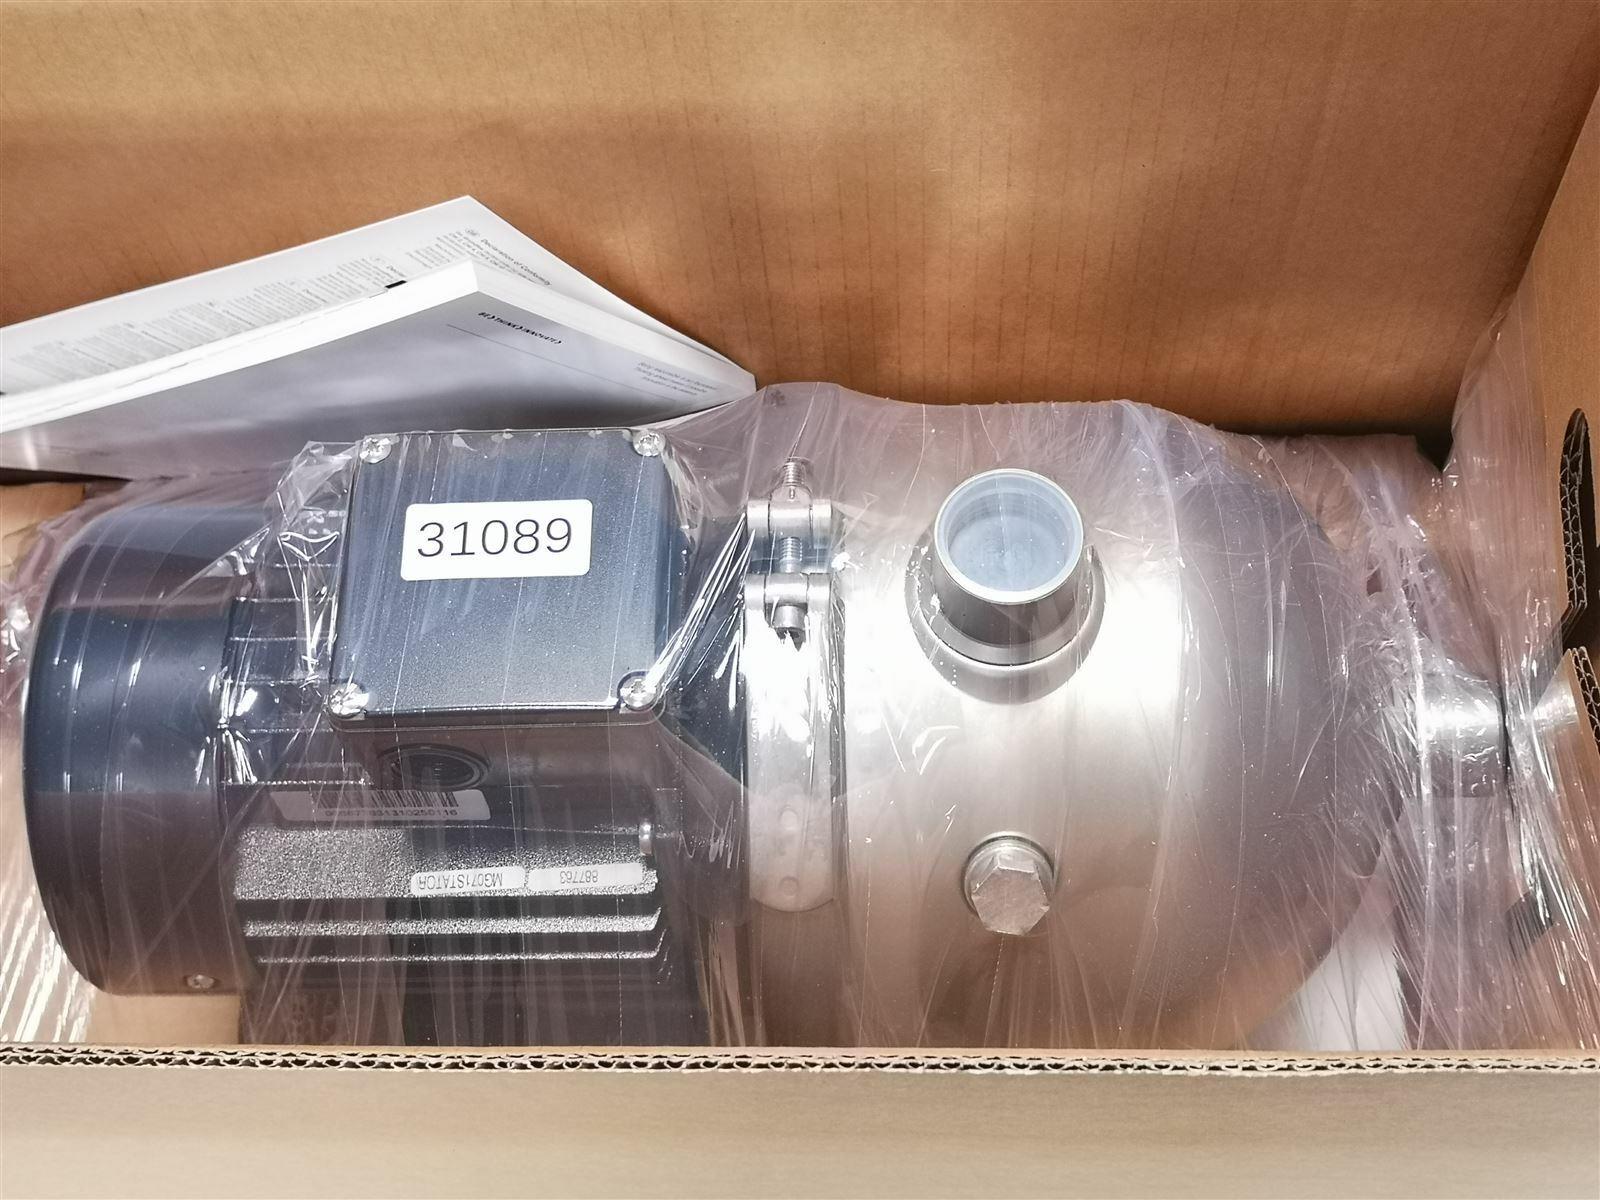 Grundfos CHI2-50 A-W-G-BQQE Rotary Pump Booster Pump